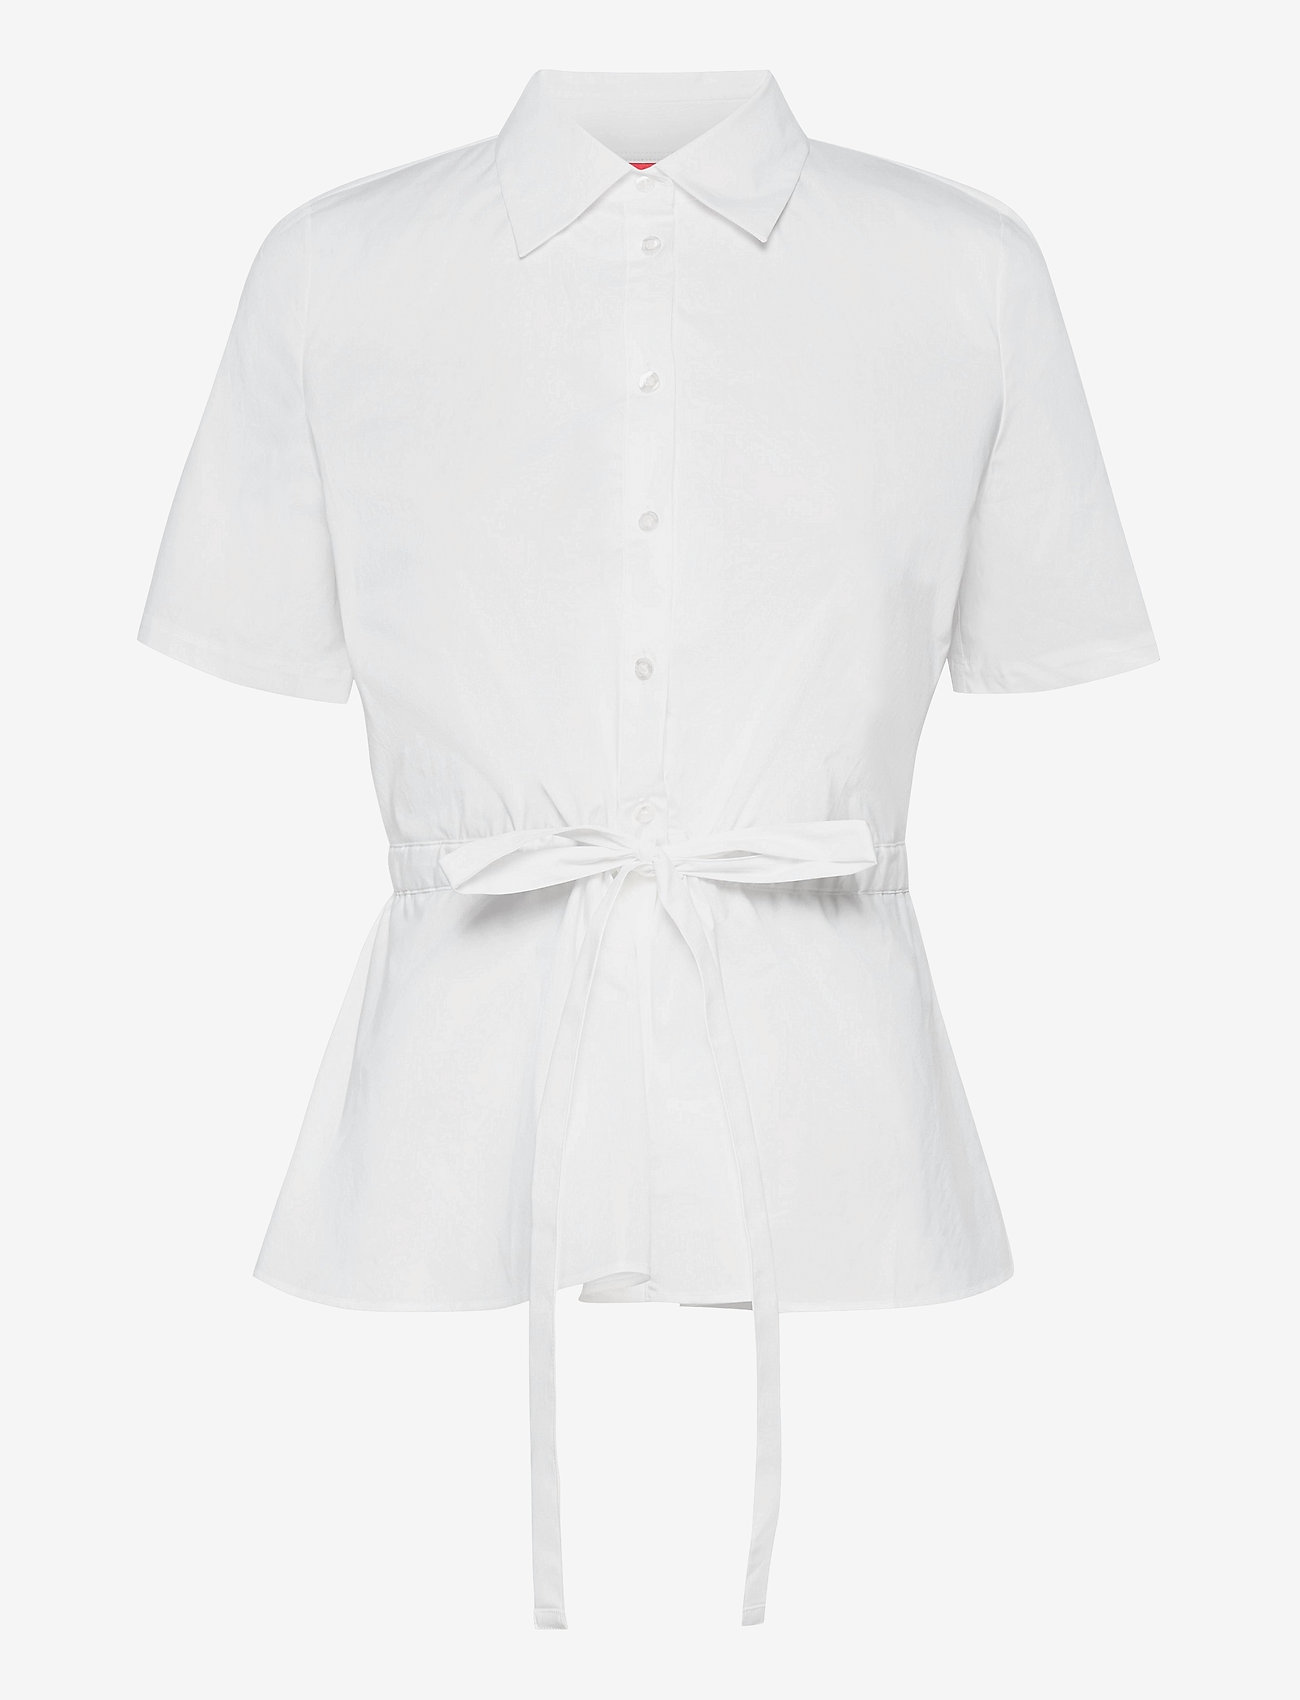 HUGO - Ezina - blouses à manches courtes - white - 0